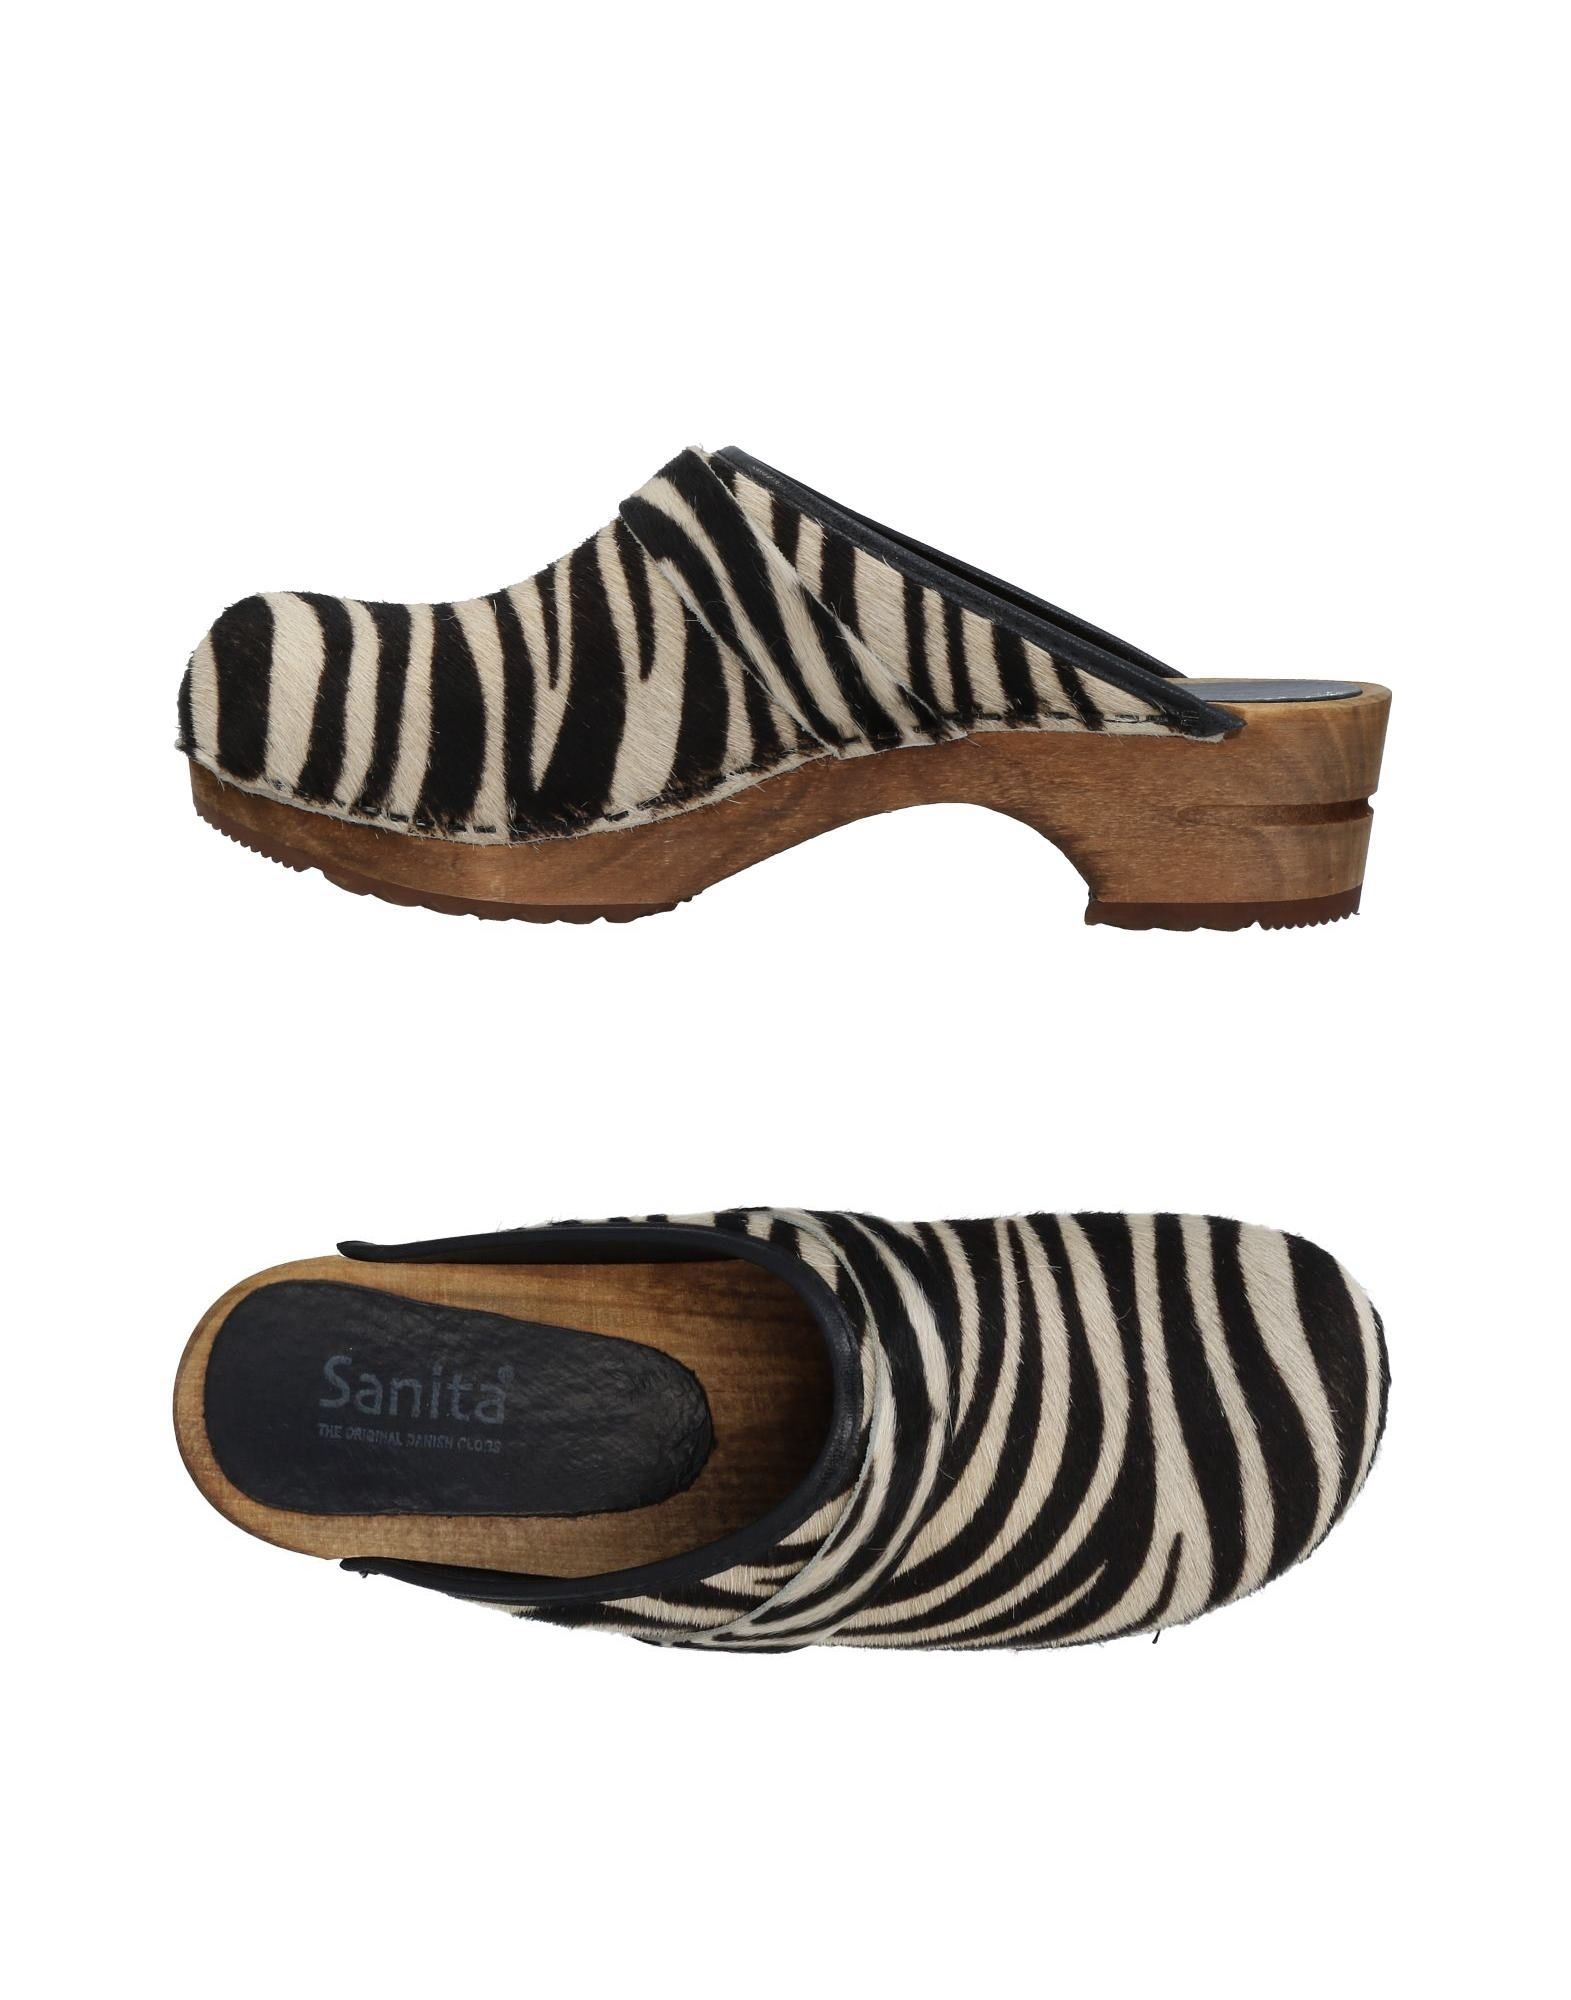 Sanita Pantoletten Damen  11462287SJ Gute Qualität beliebte Schuhe